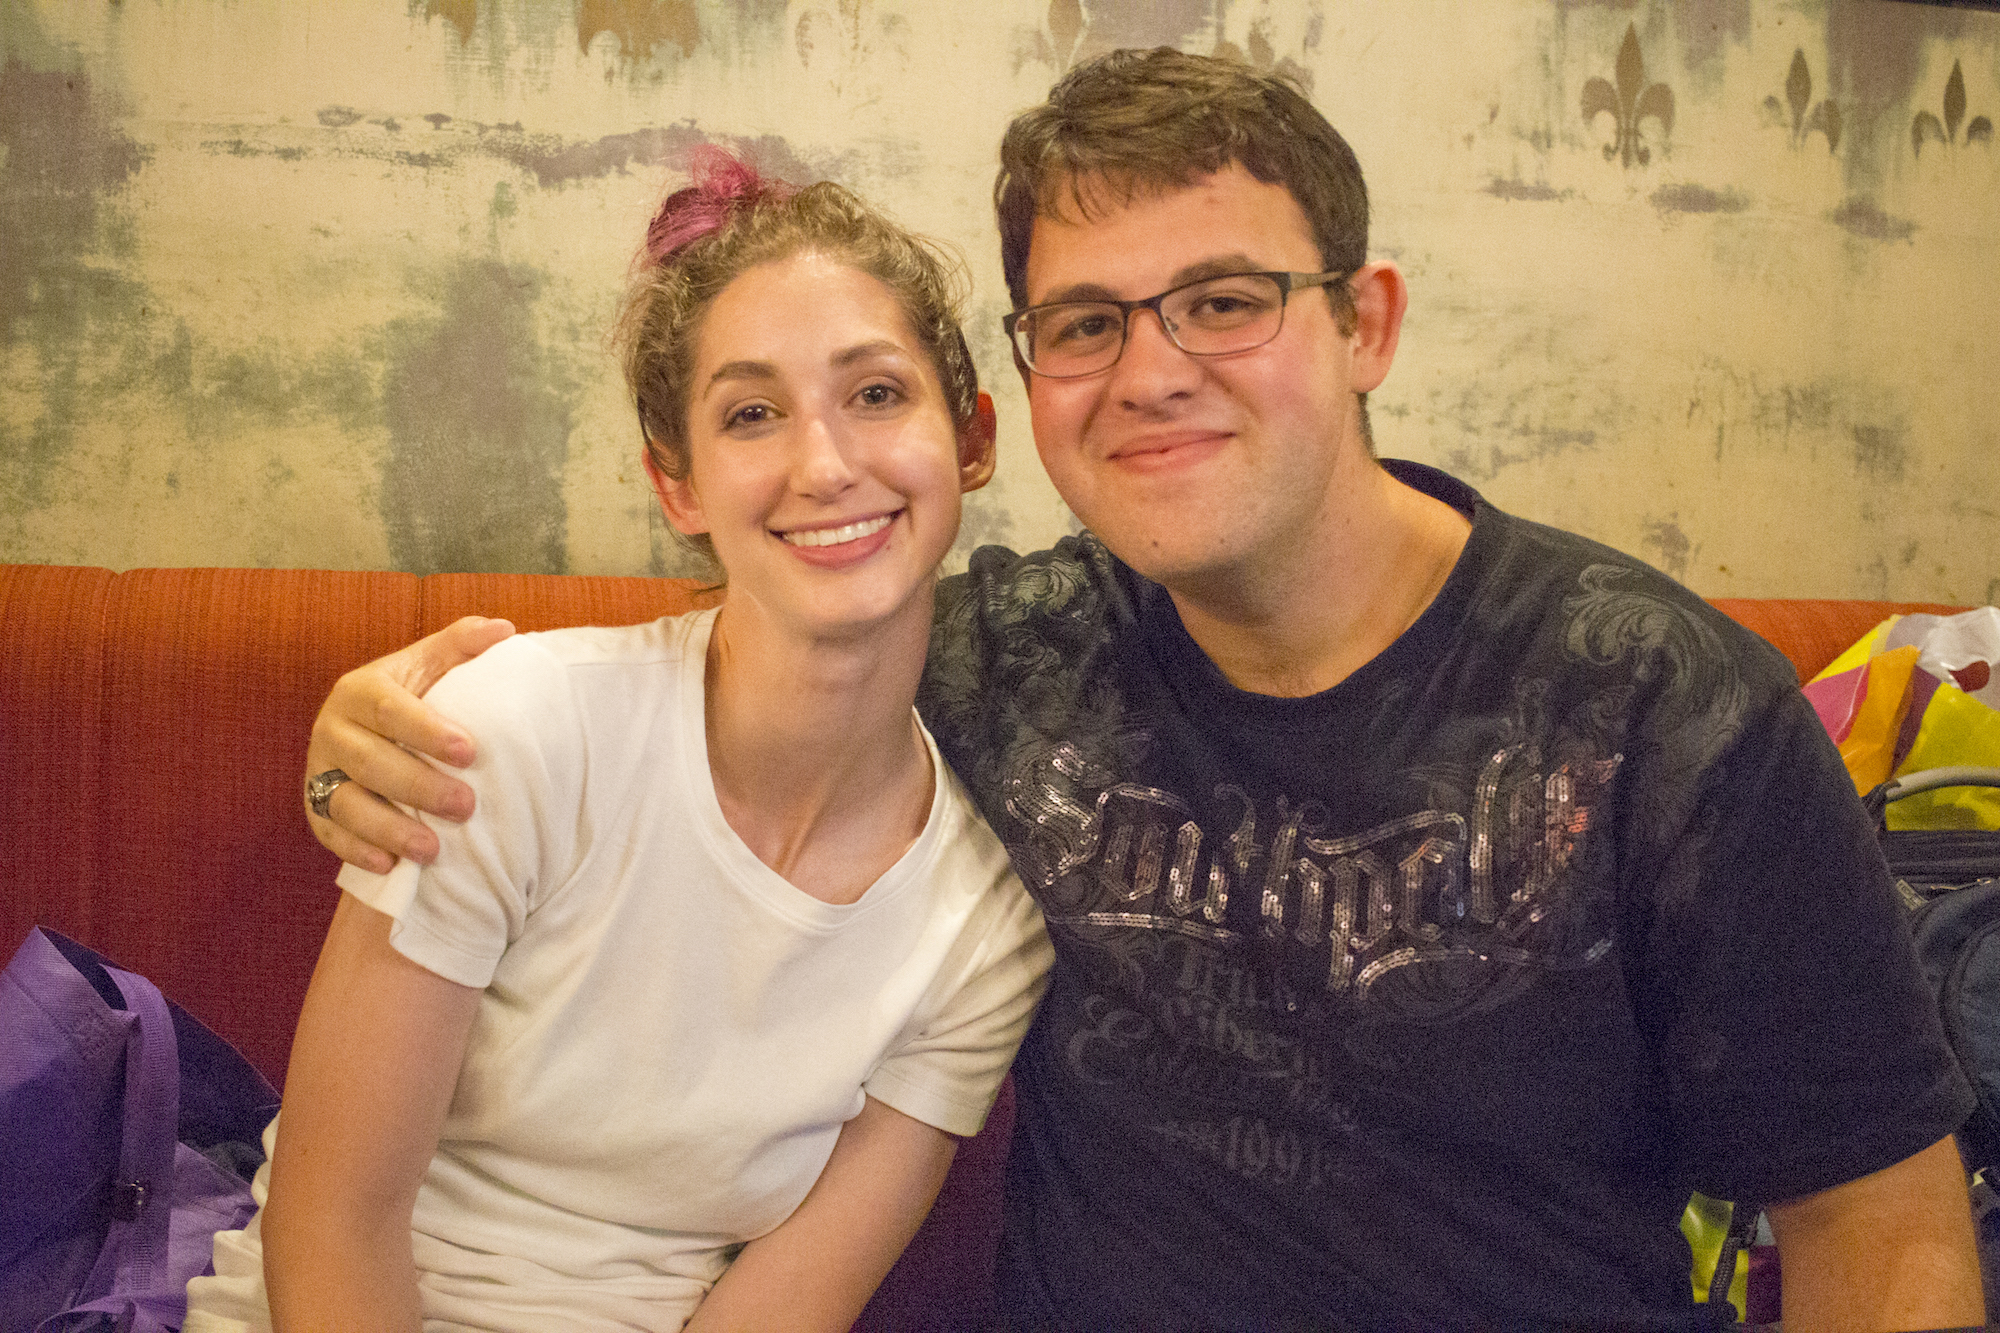 Geena Matuson (@geenamatuson) and Jonathan Reizes in Rishon LeZion, Israel, September 2017.